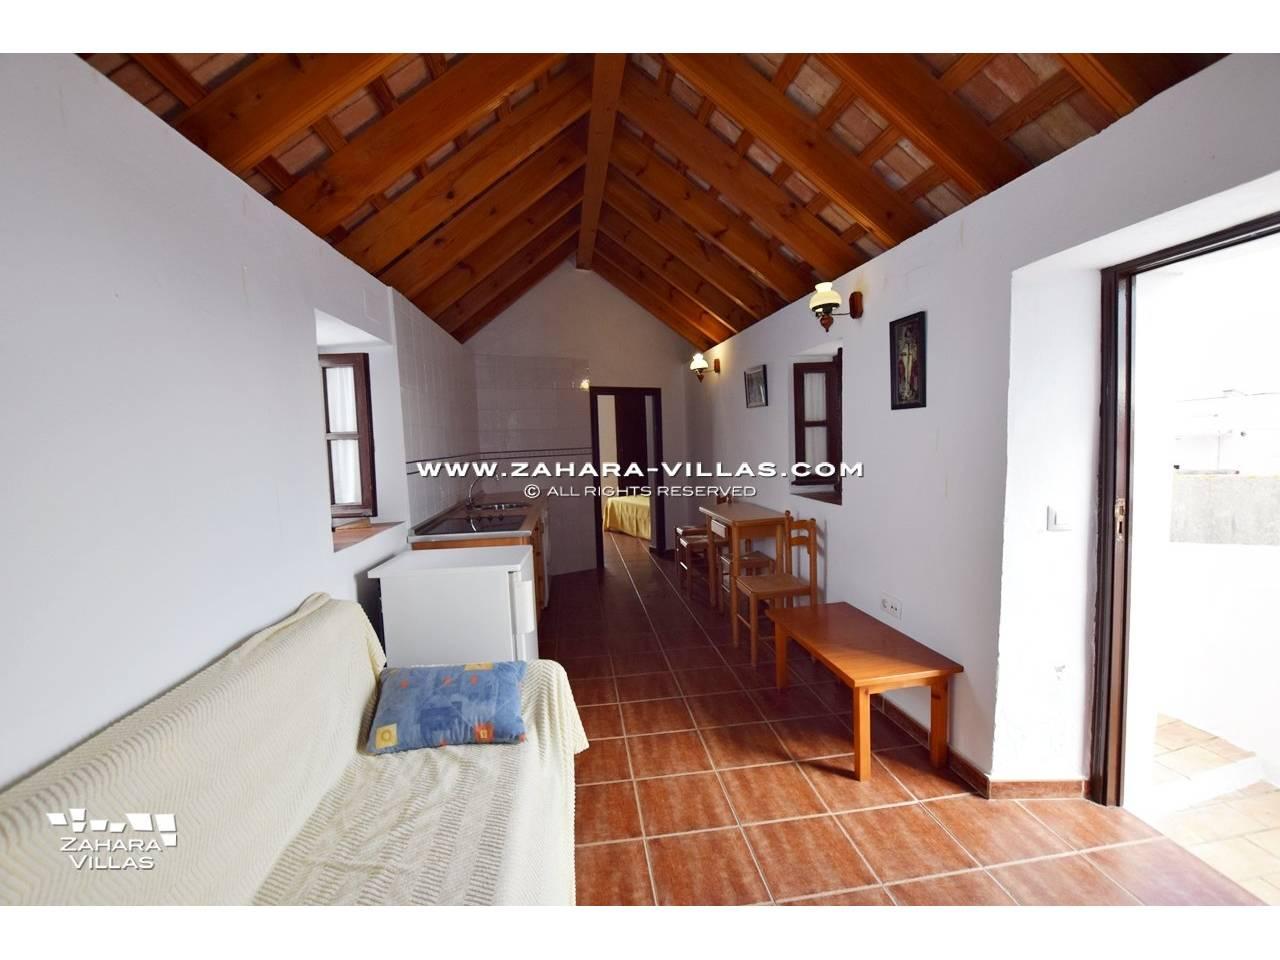 Imagen 3 de House, Apartment and Plot to build in the historic center of Vejer de la Frontera